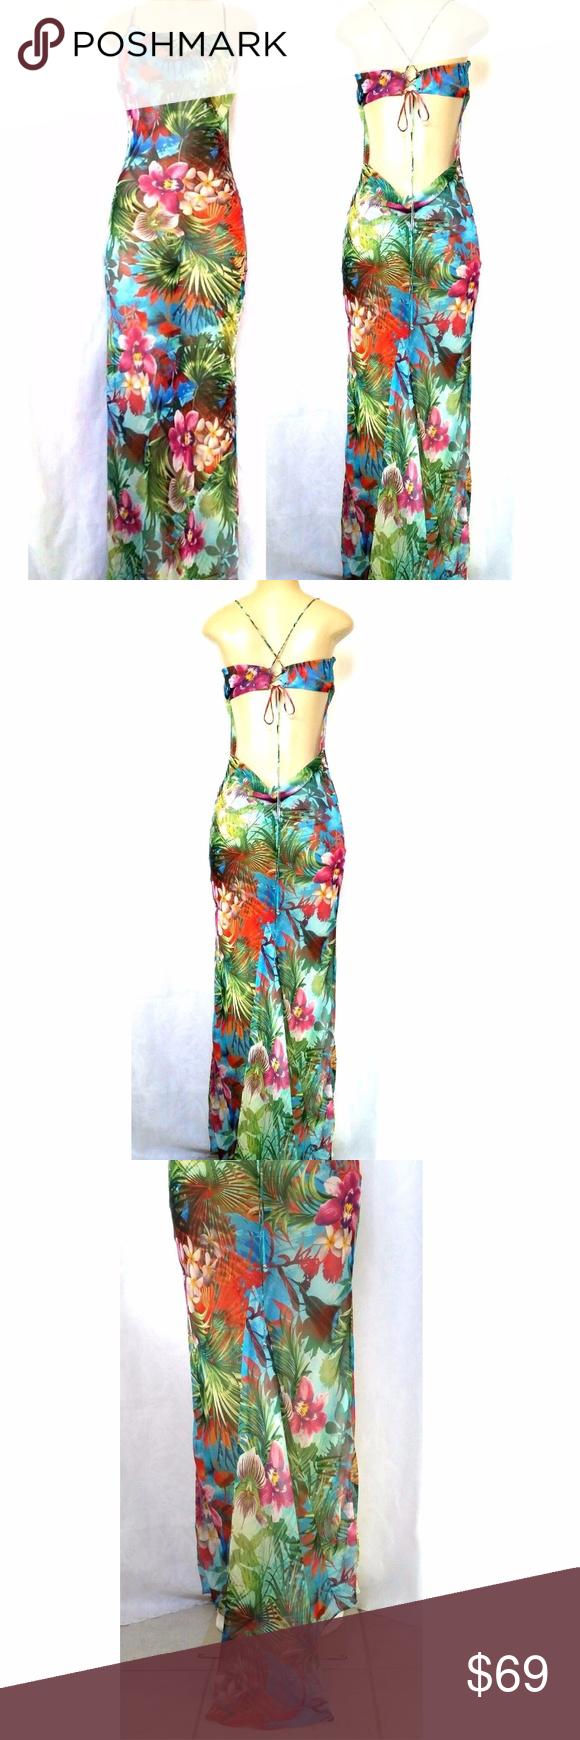 Victoria Secret Maxi Dress Sheer Tropical Cover Up Victoria S Secret Maxi Dress Cover Up An Open Back With Twisted St Sheer Dress Dresses Maxi Dress Coverup [ 1740 x 580 Pixel ]